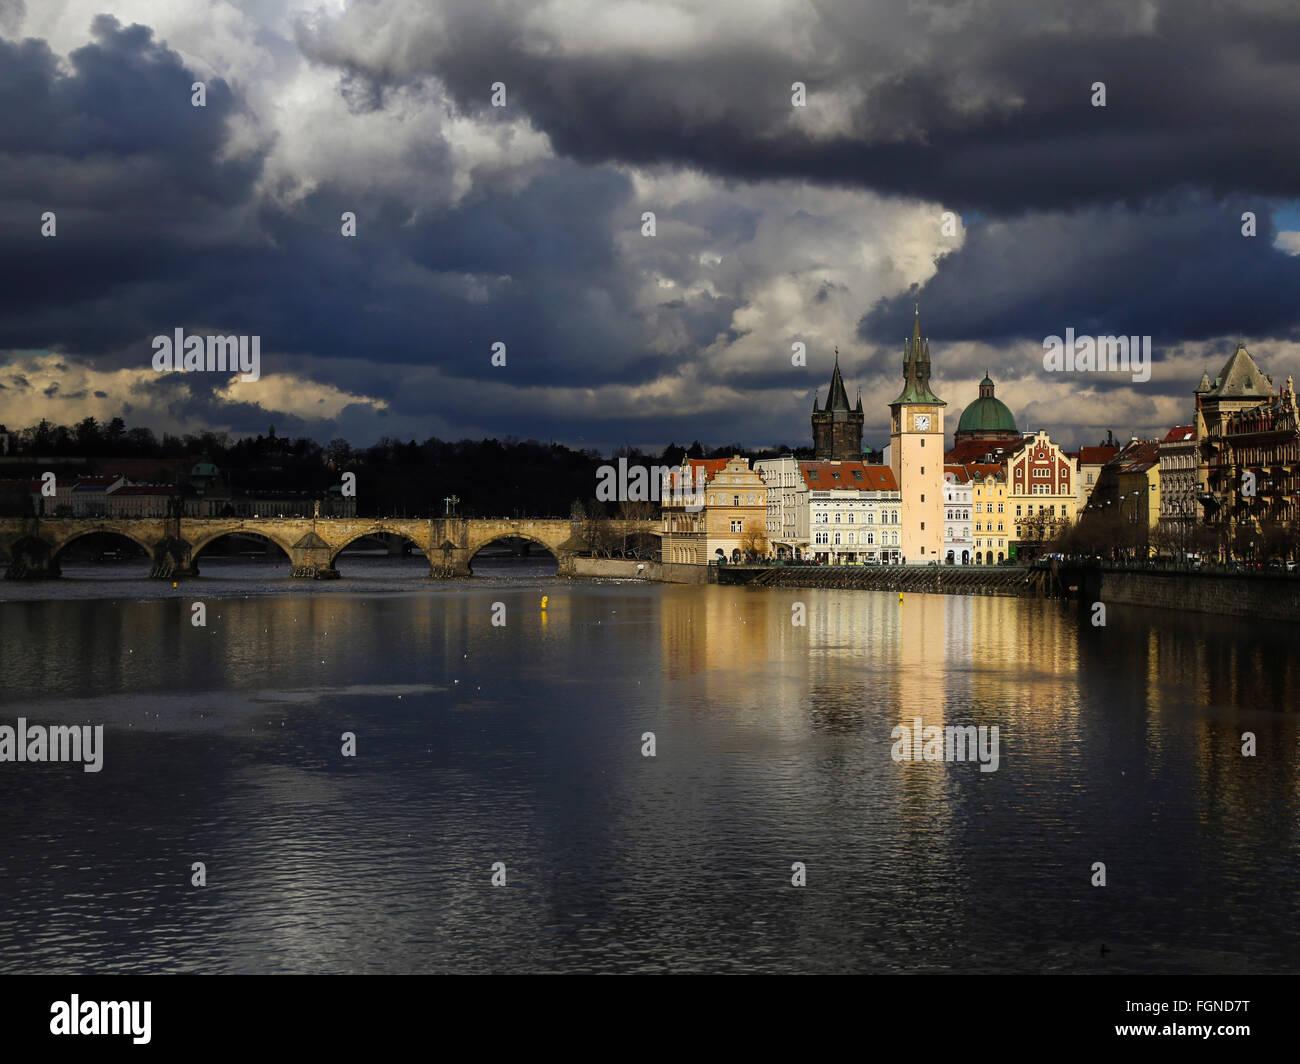 Charles bridge and Vltava riverside with dramatic sky (Prague, Czech Republic) - Stock Image